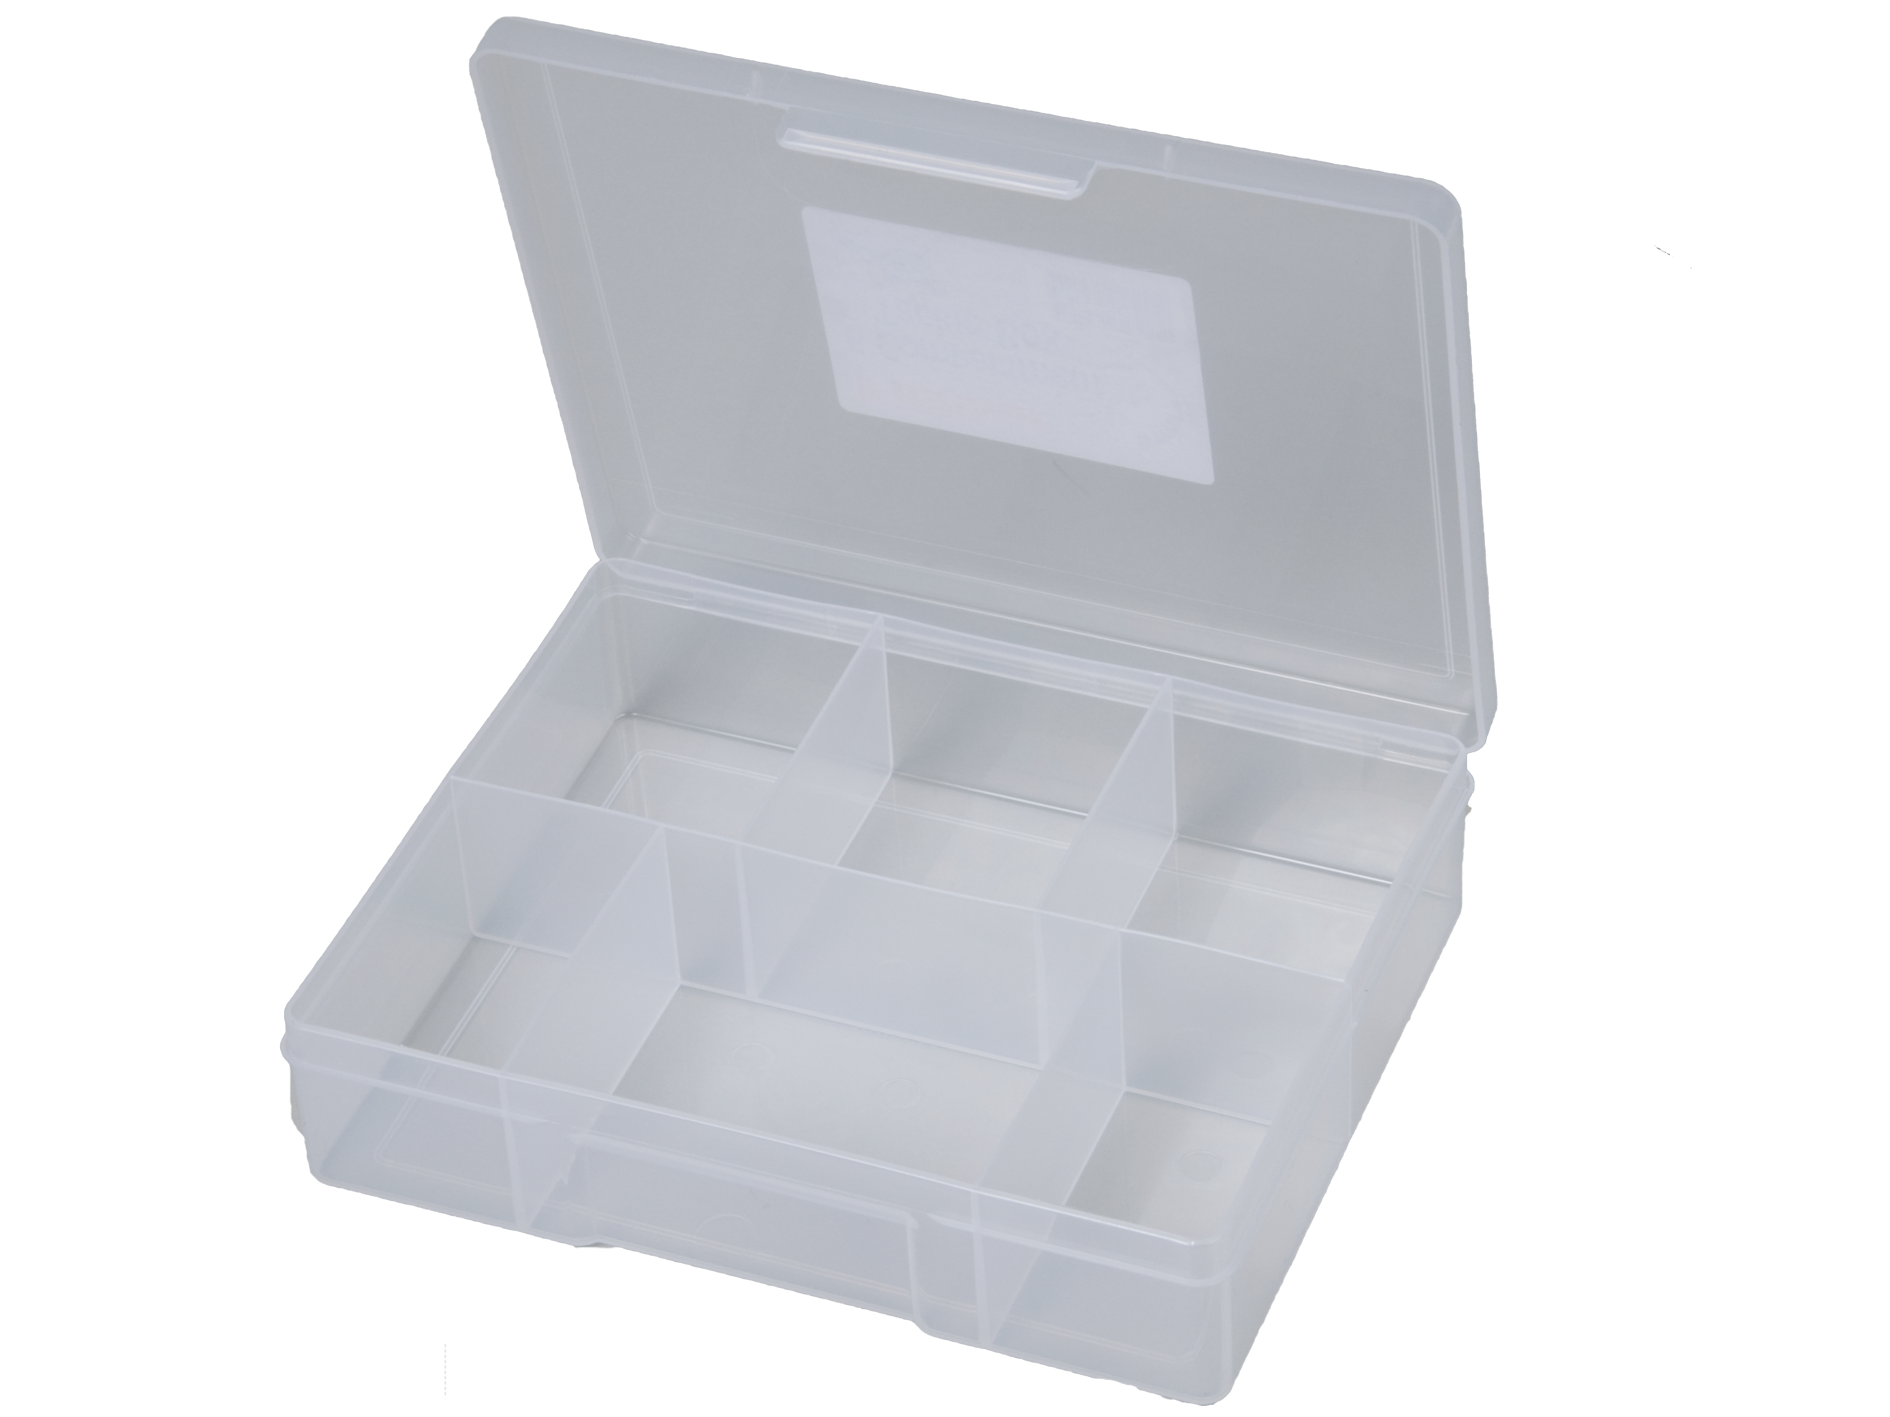 1H-038b - 6 Compt Storage Box